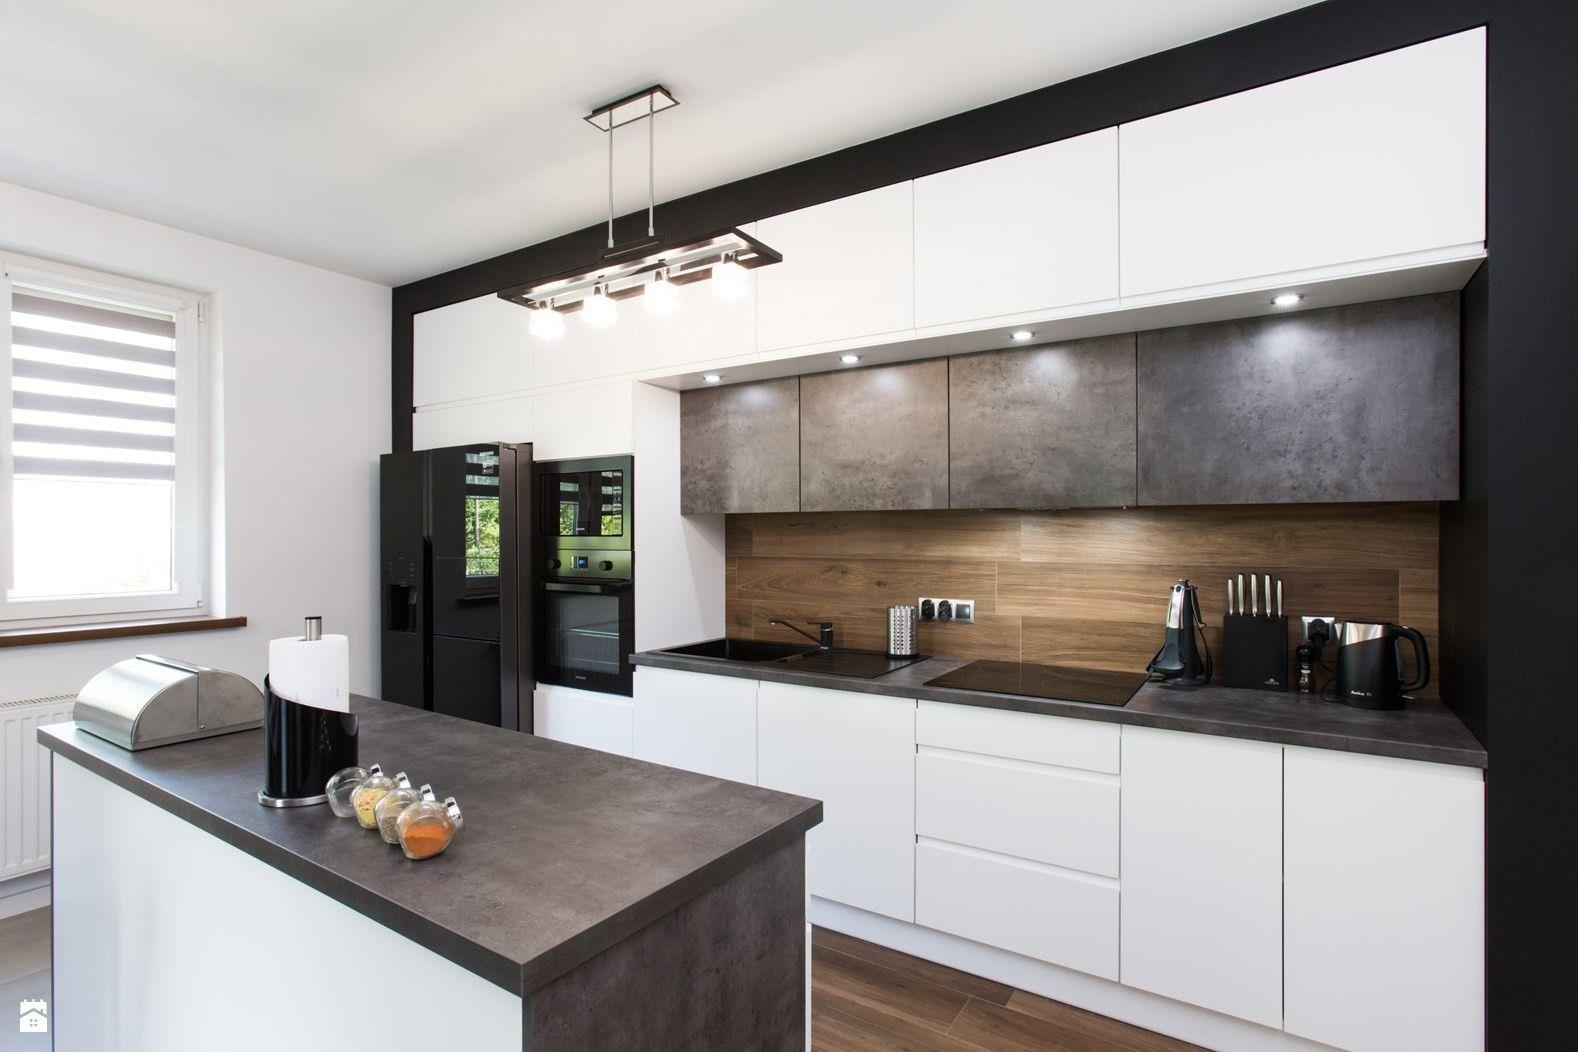 Kitchen   Kitchen design small, Small kitchen design ...